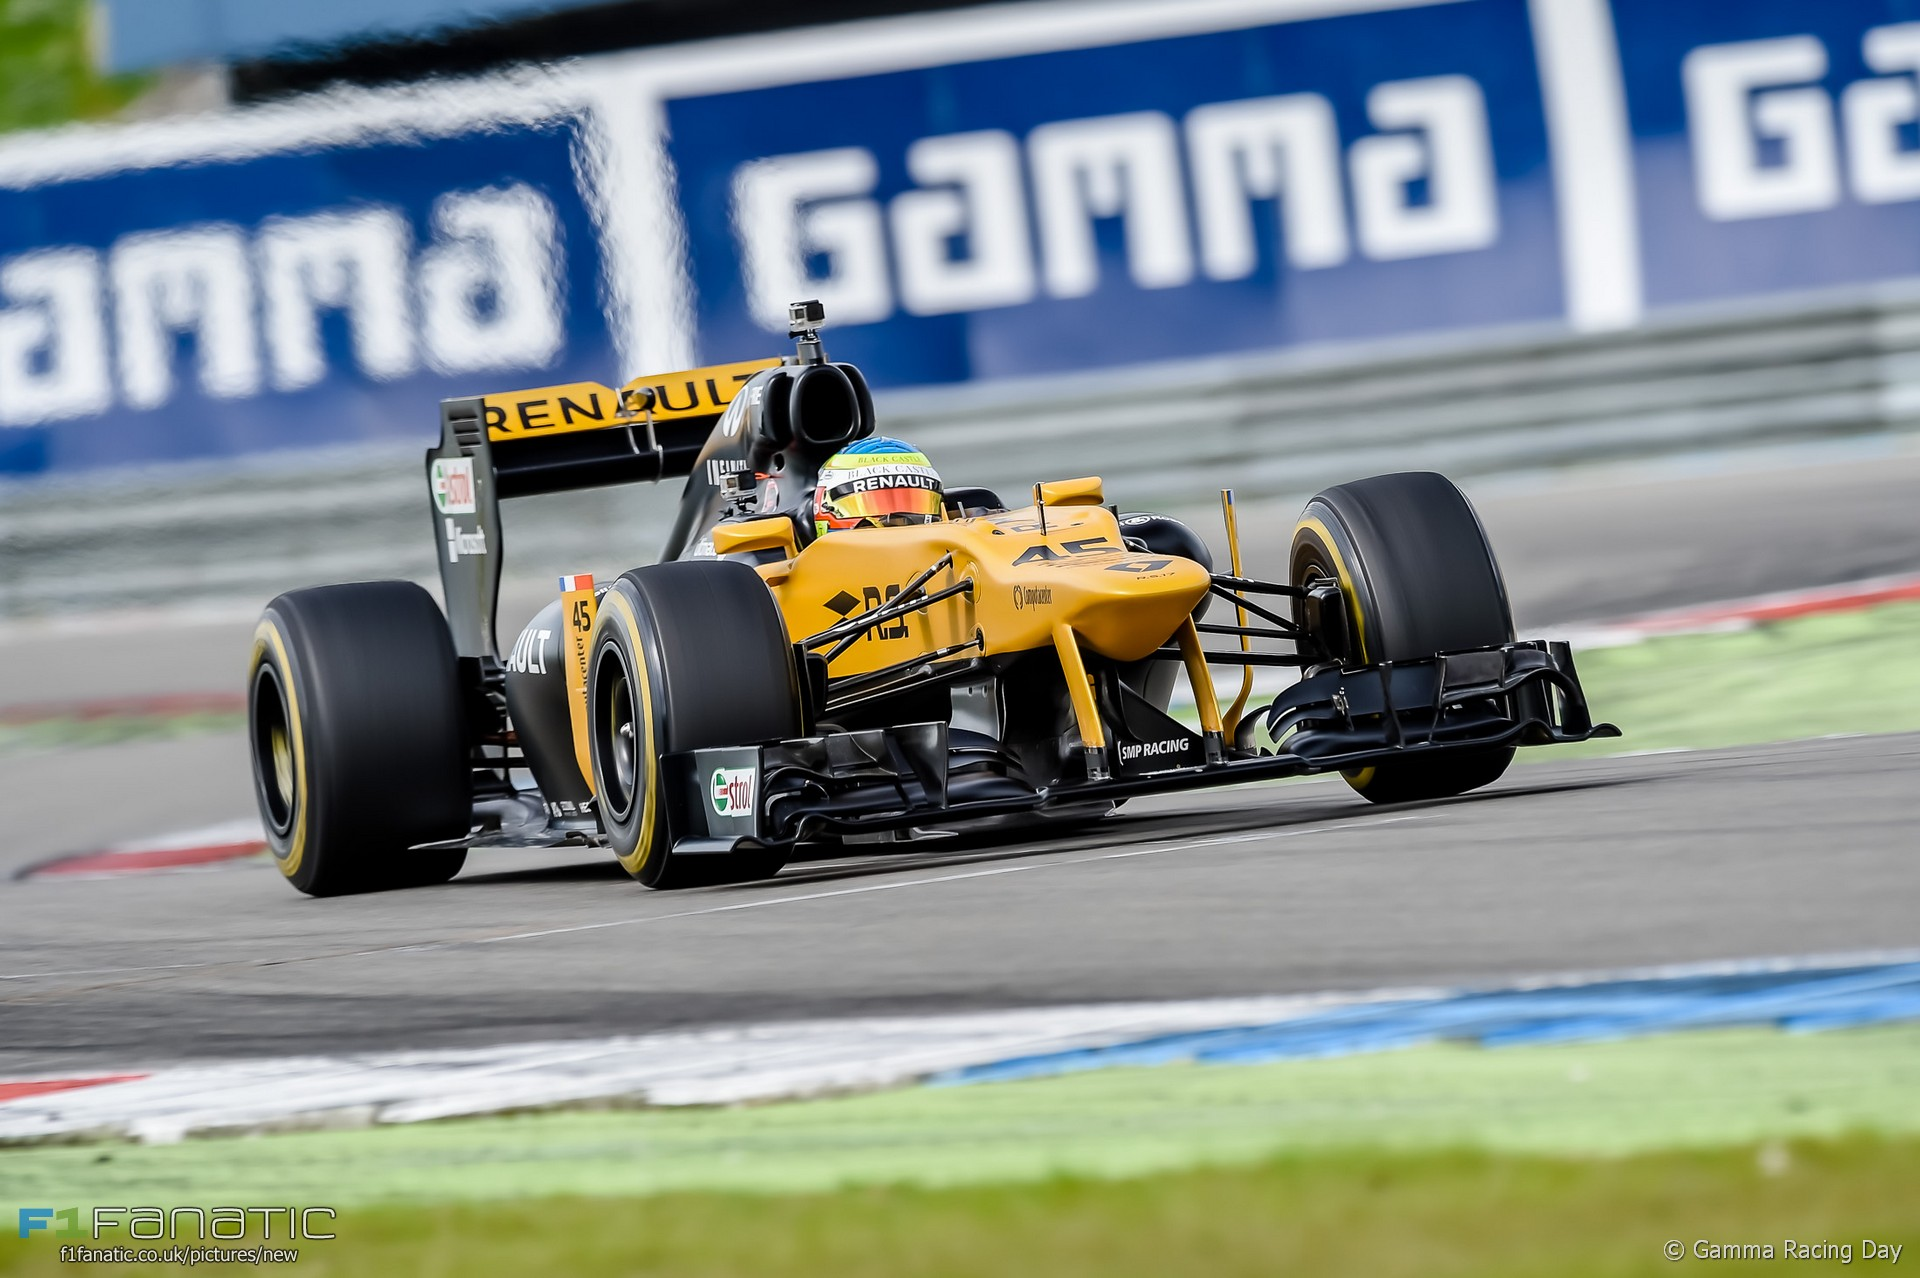 Oliver Rowland, Renault, Assen, 2017